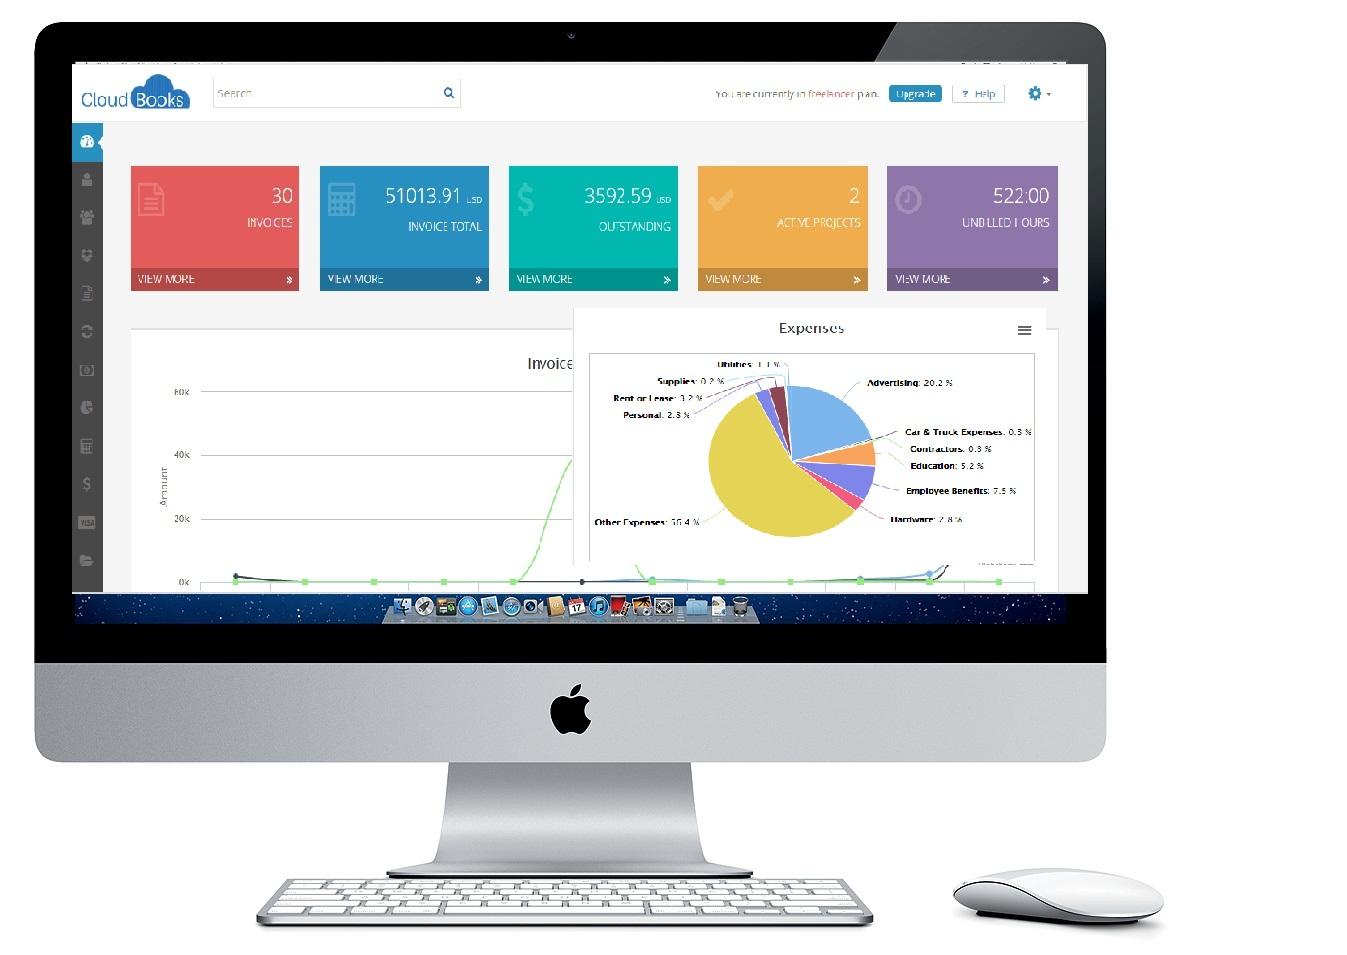 Invoice Management Software Invoice Management System For Small - Invoice management system